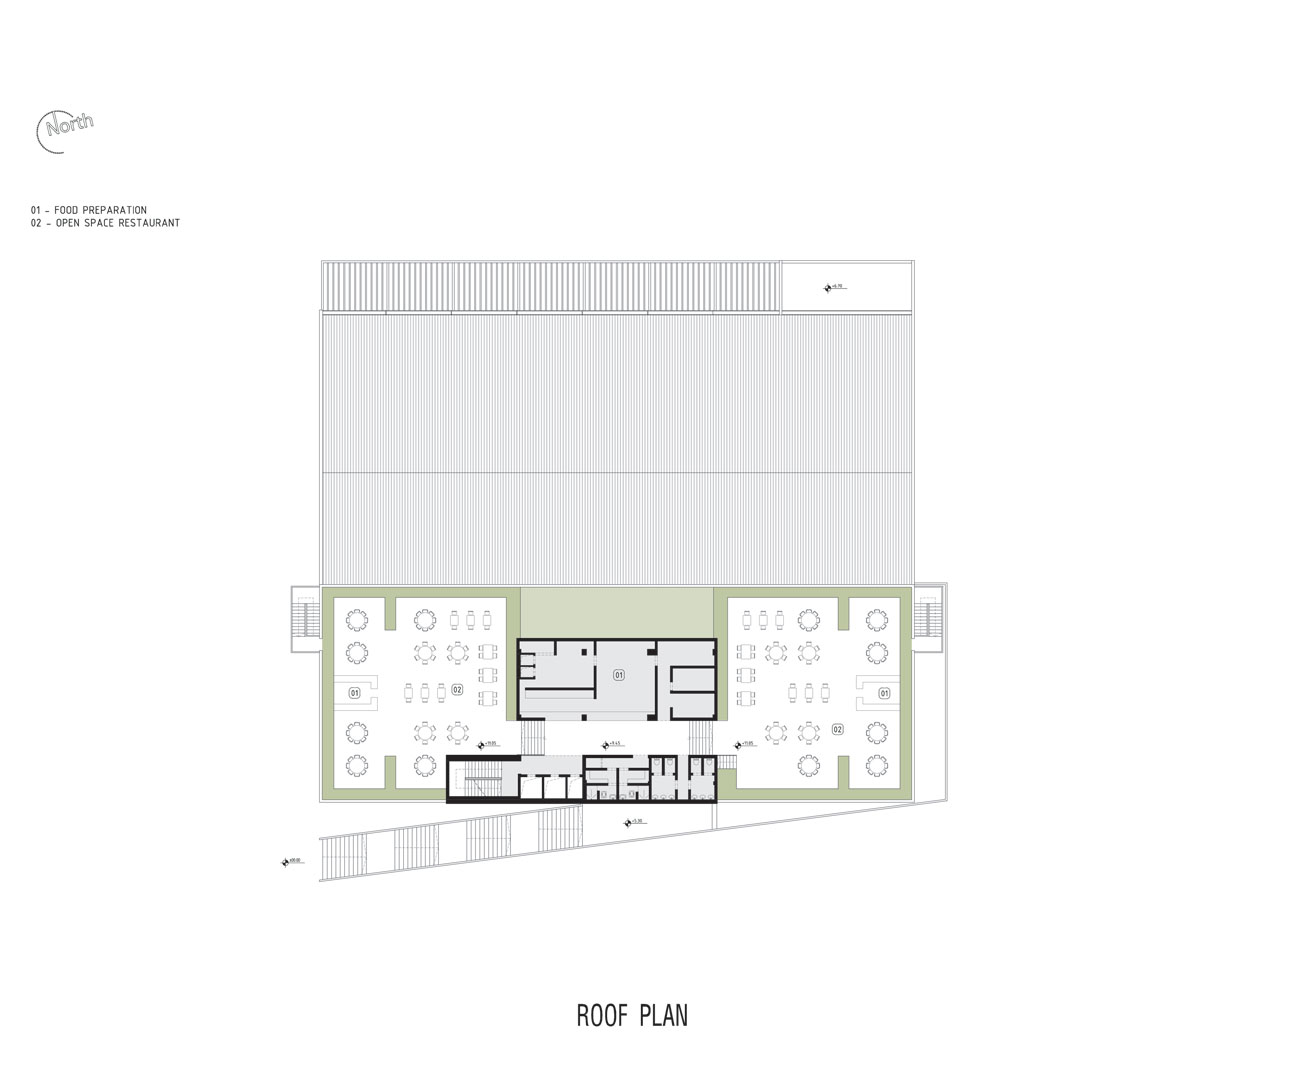 211-25-JPG-F1A-990508-04---ROOF1